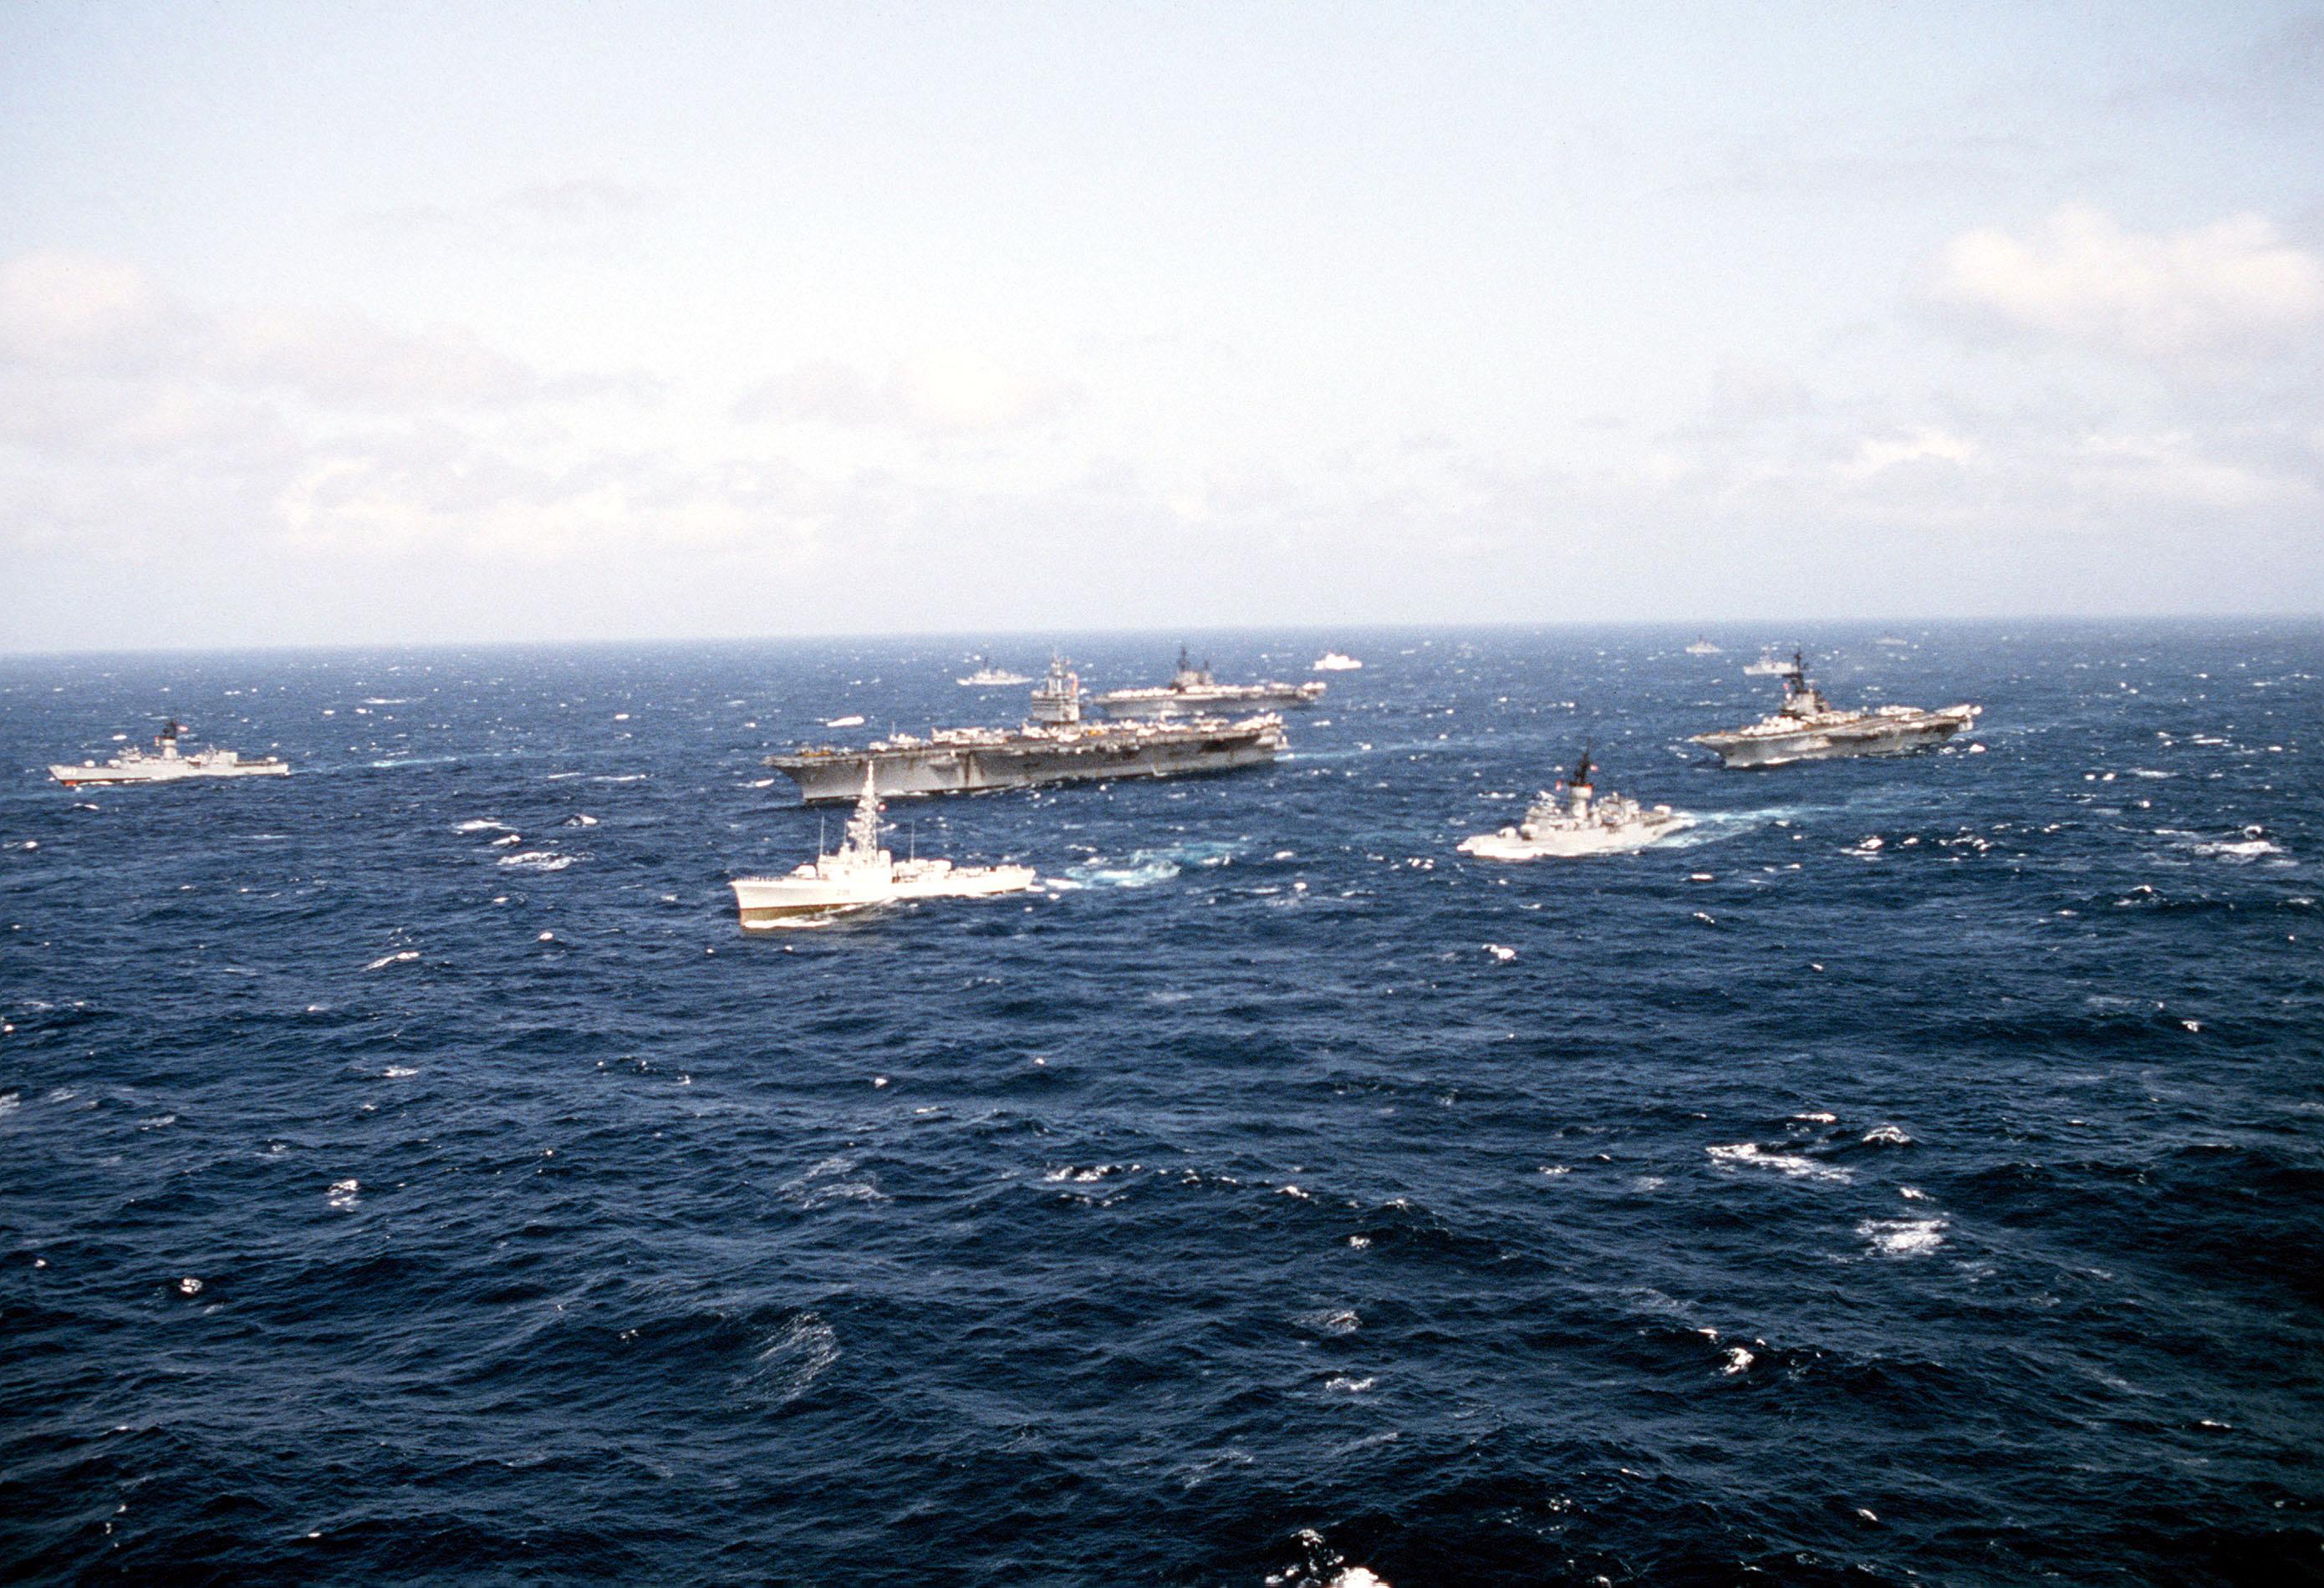 Enterprise Sea Cv 65 41 Uss Uss Coral Cv Uss 43 Midway Cv